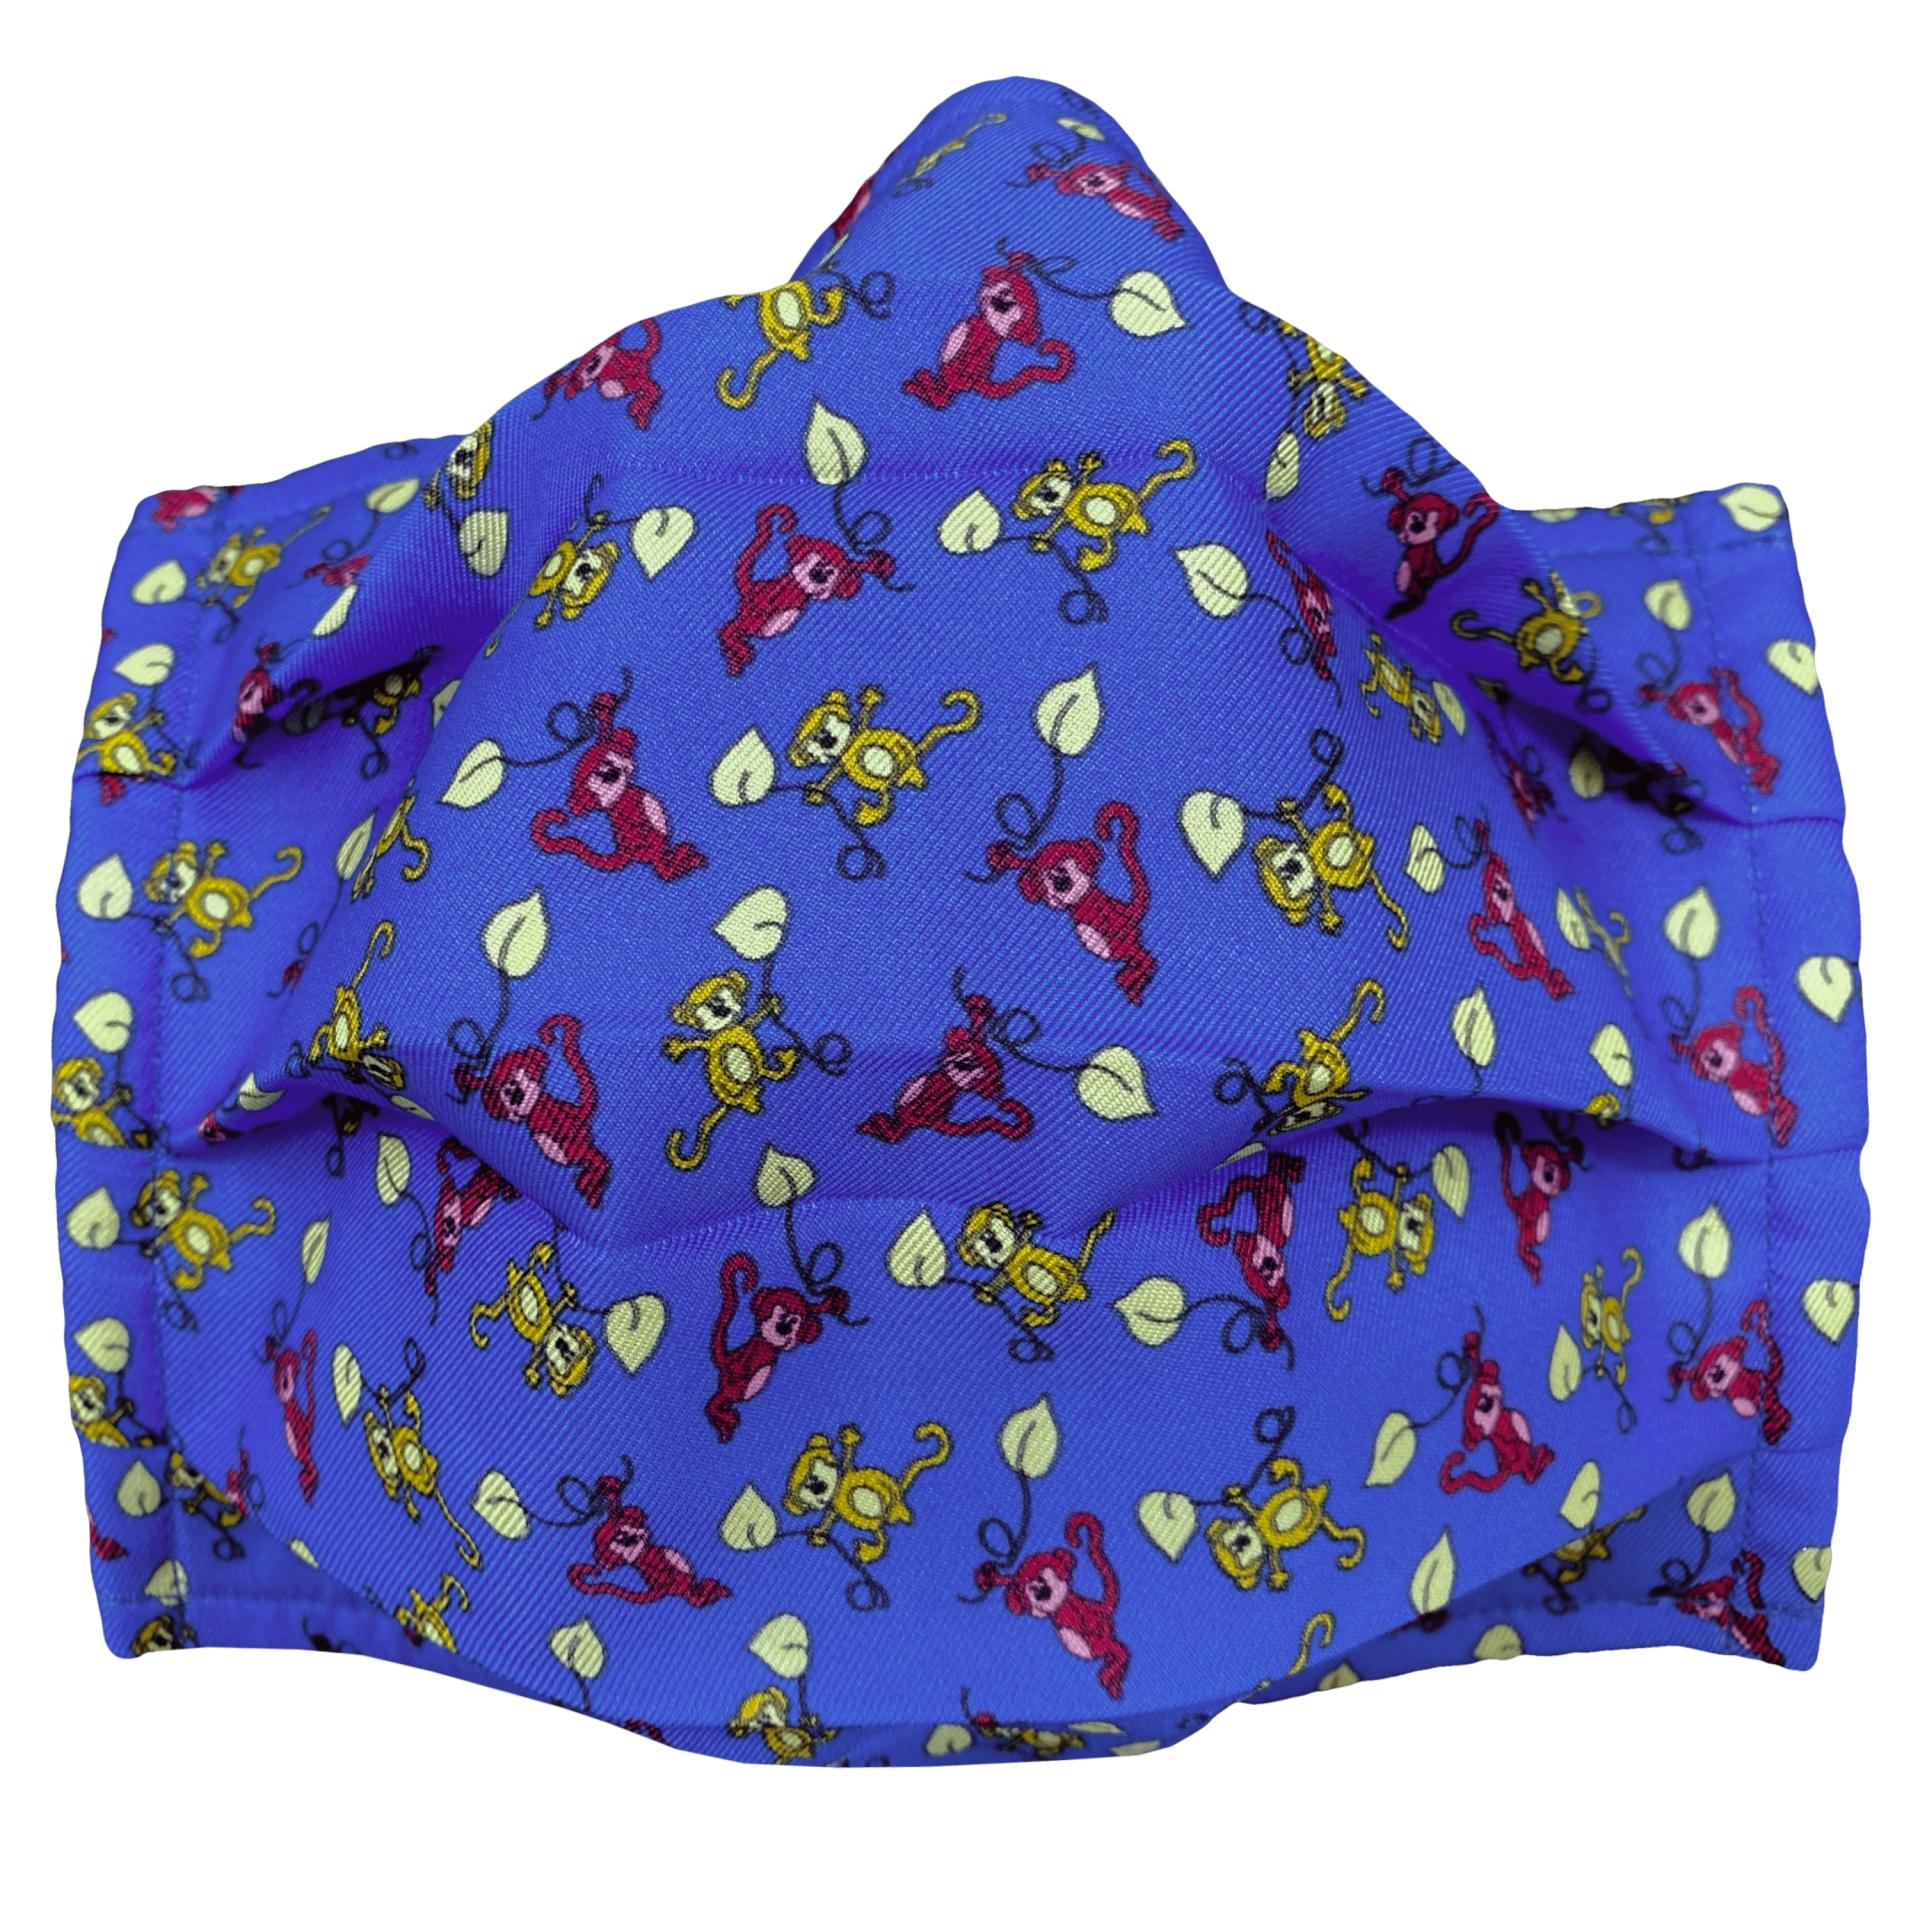 StyleMask Mascherina da bambino blu fantasia scimmie rosse e gialle